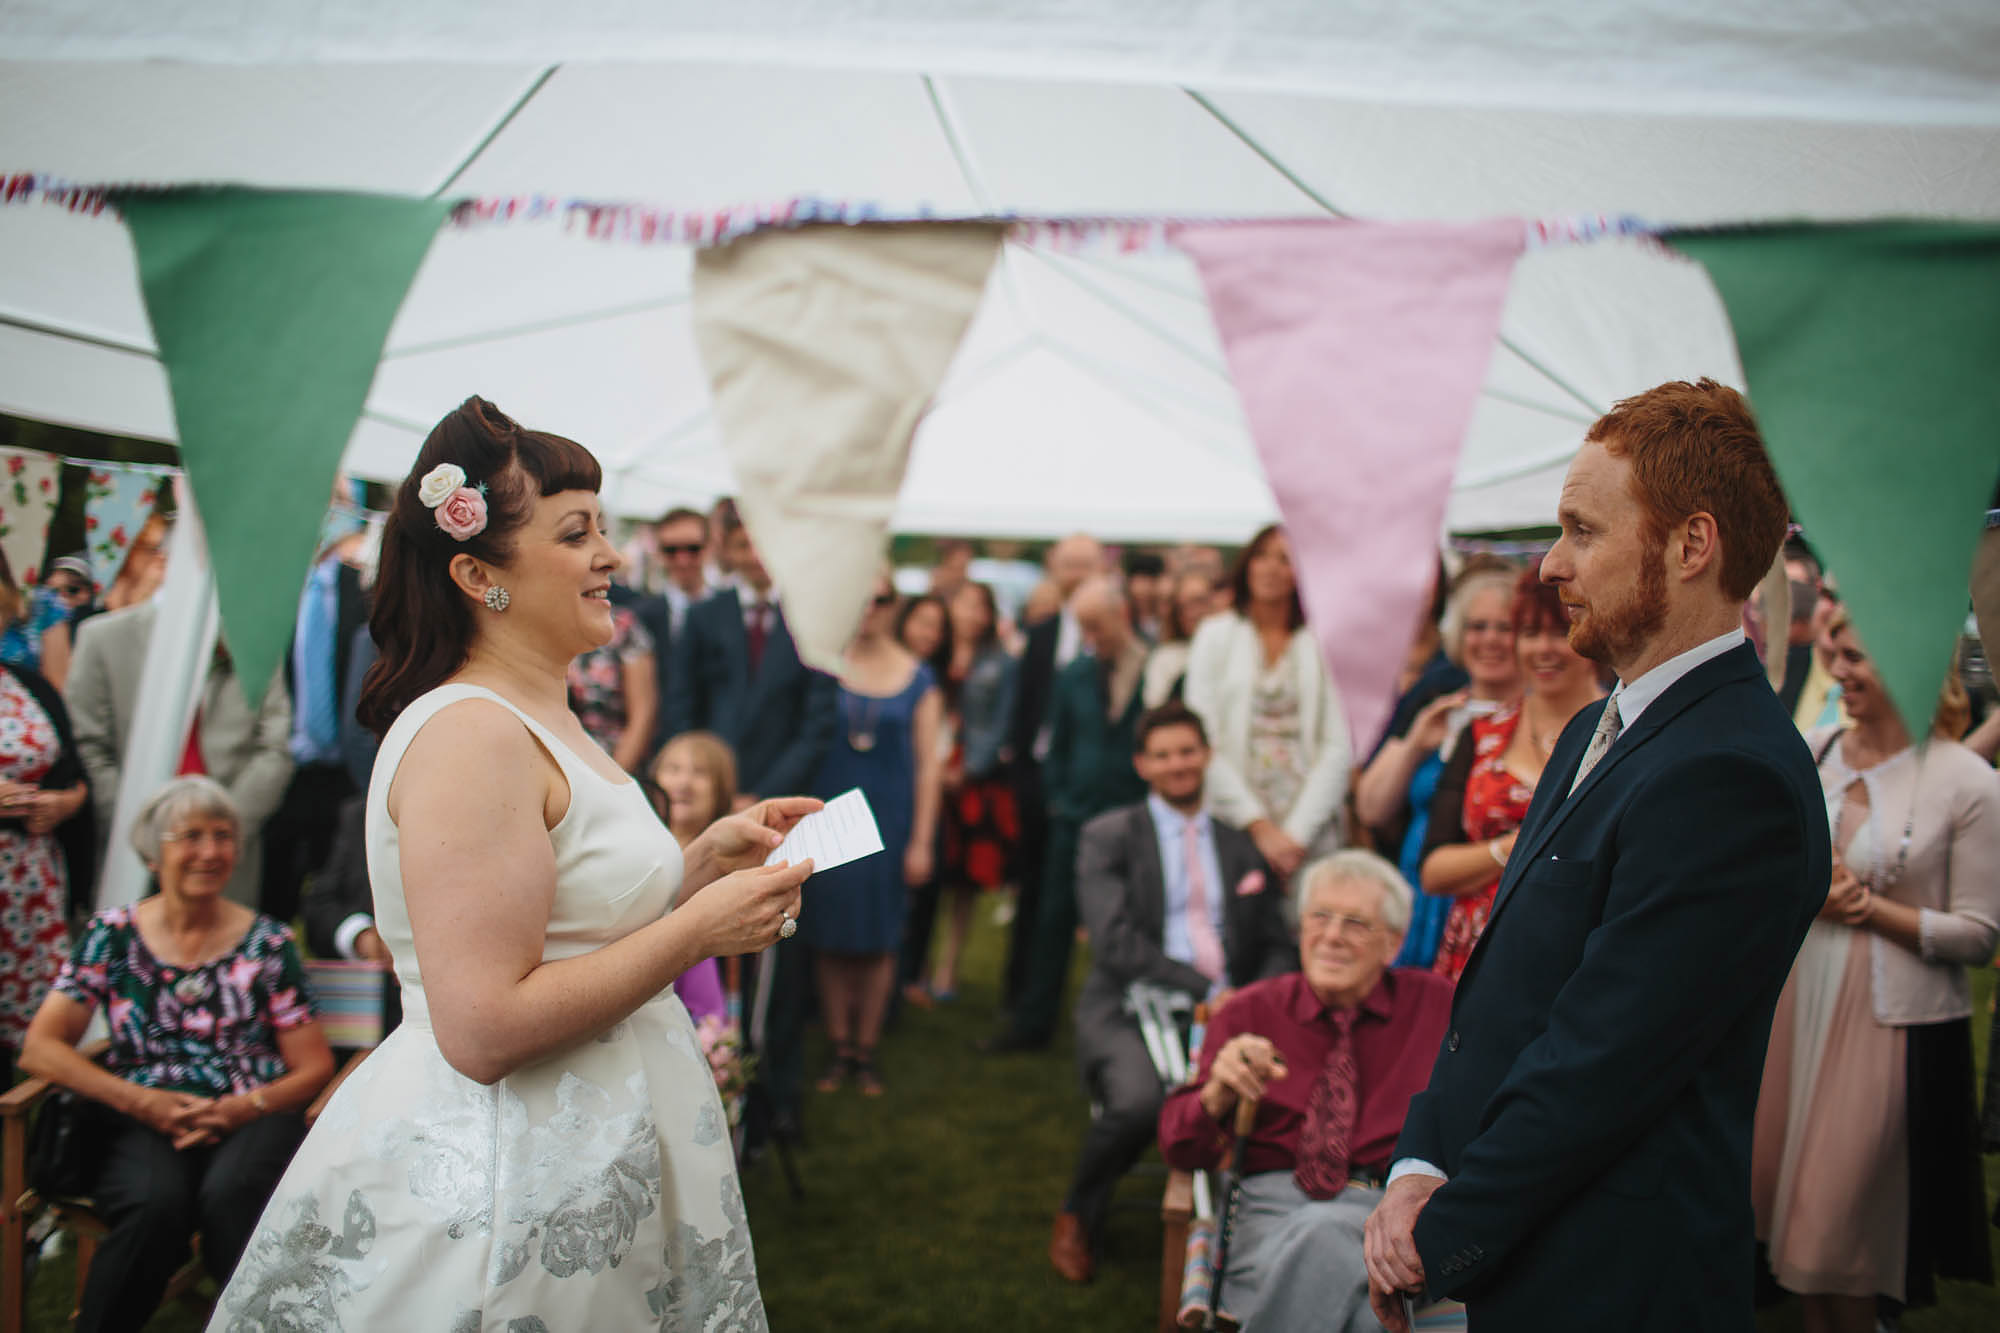 Leeds Yorkshire Wedding Photographer Ceremony Bride